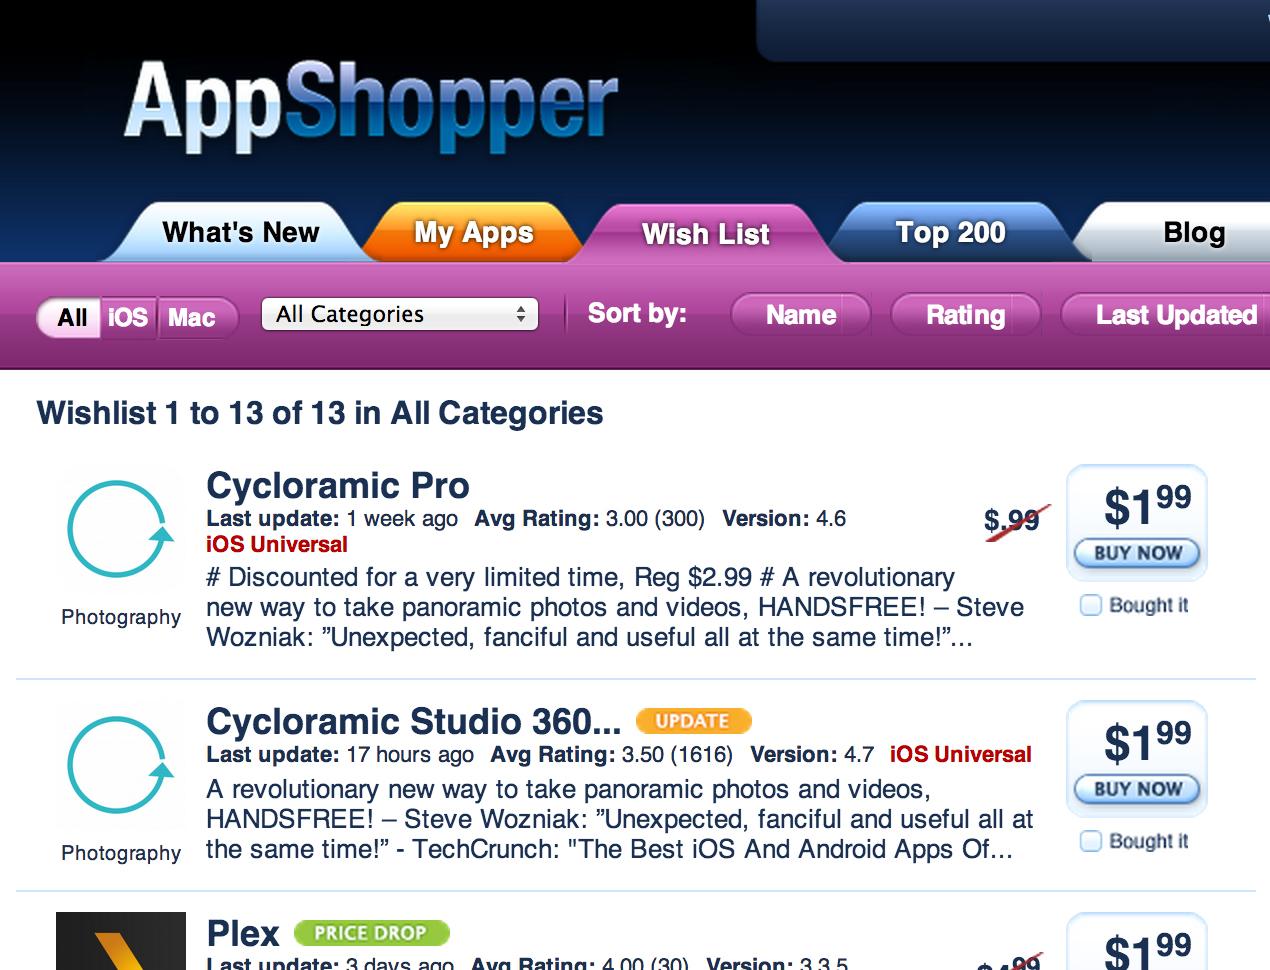 How to Get the Best iPhone App Deals